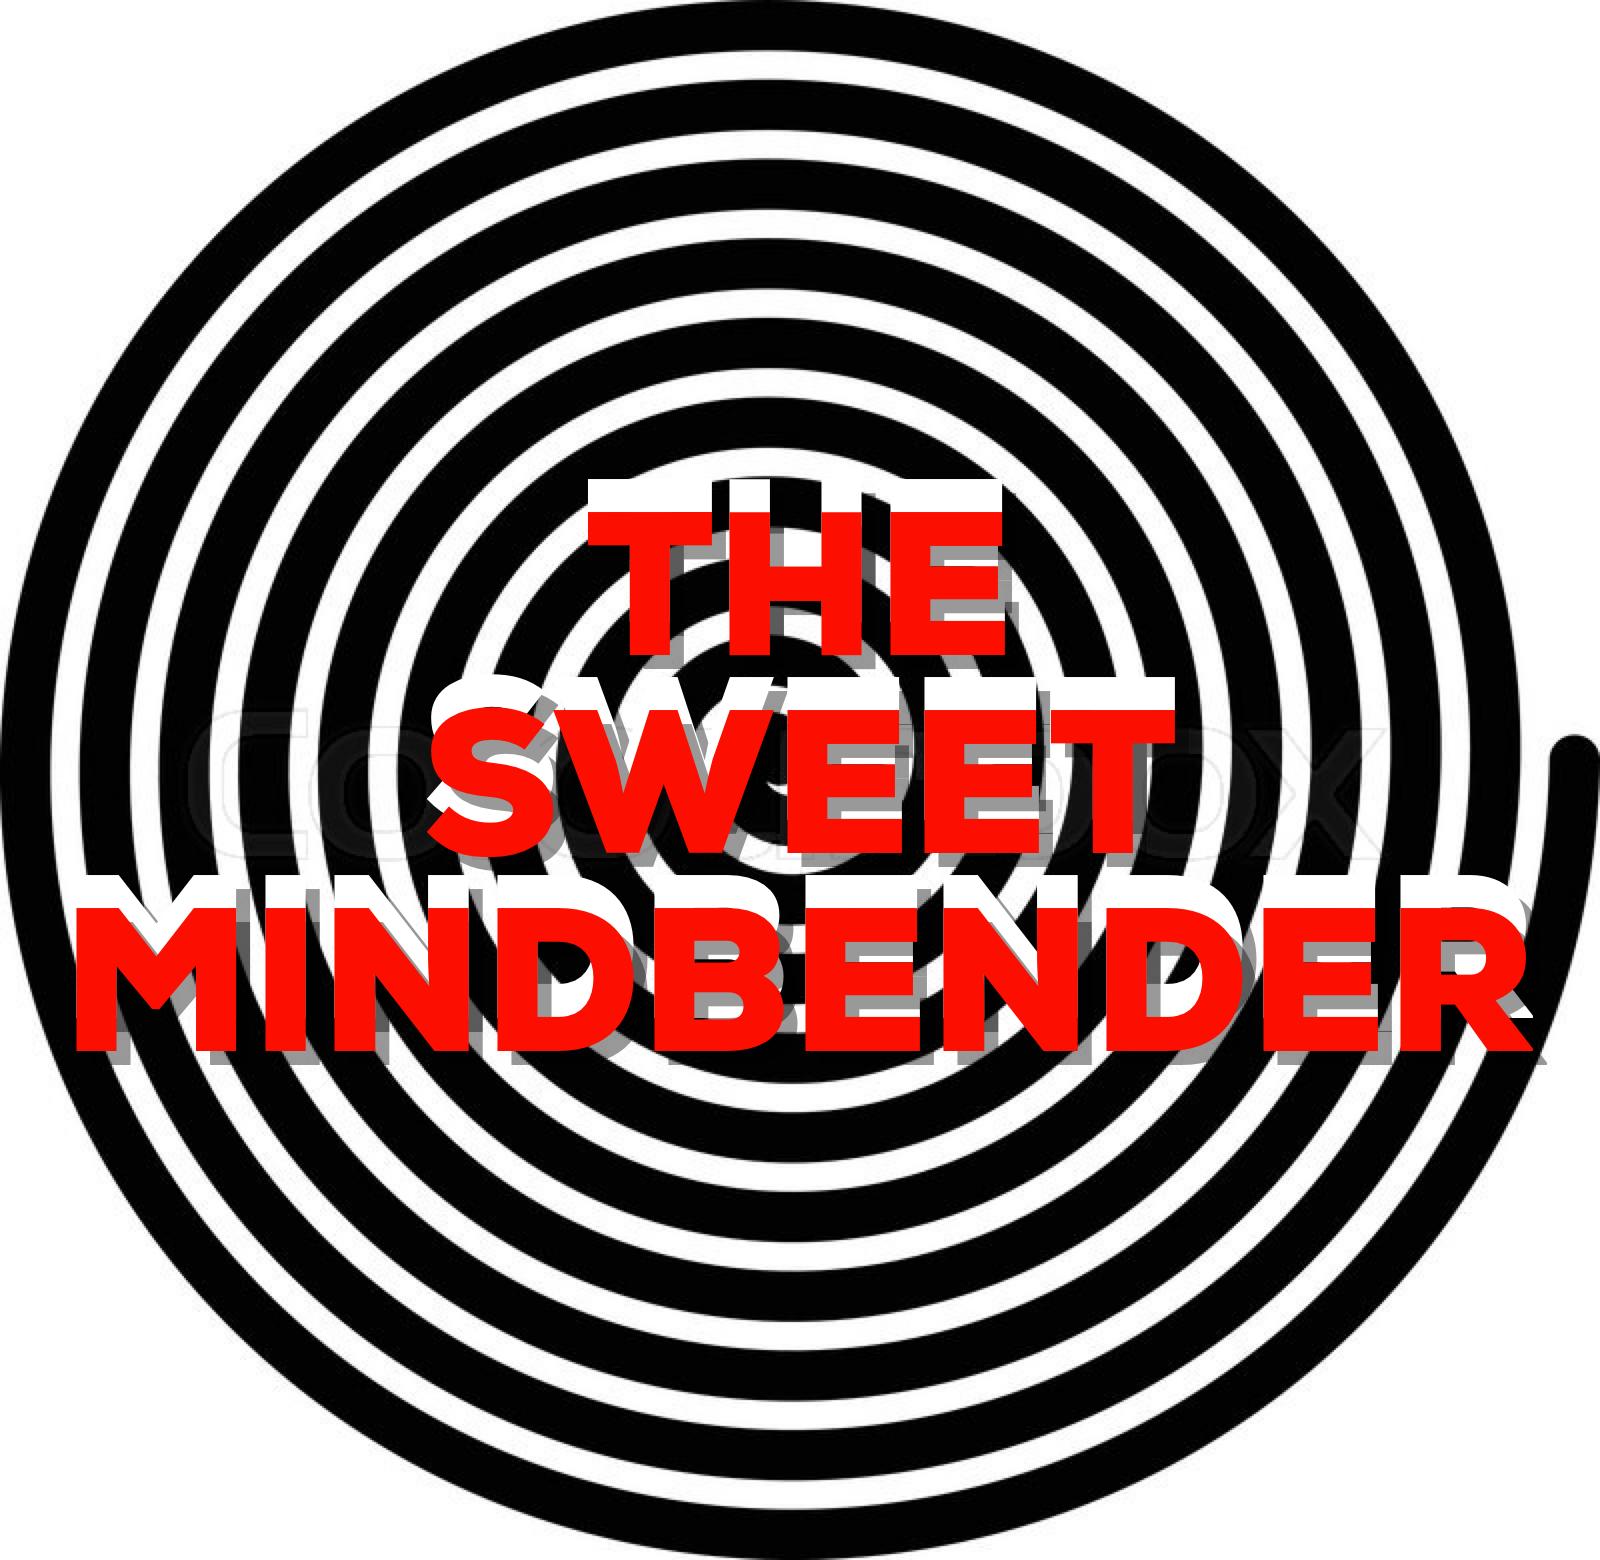 THE SWEET MINDBENDER